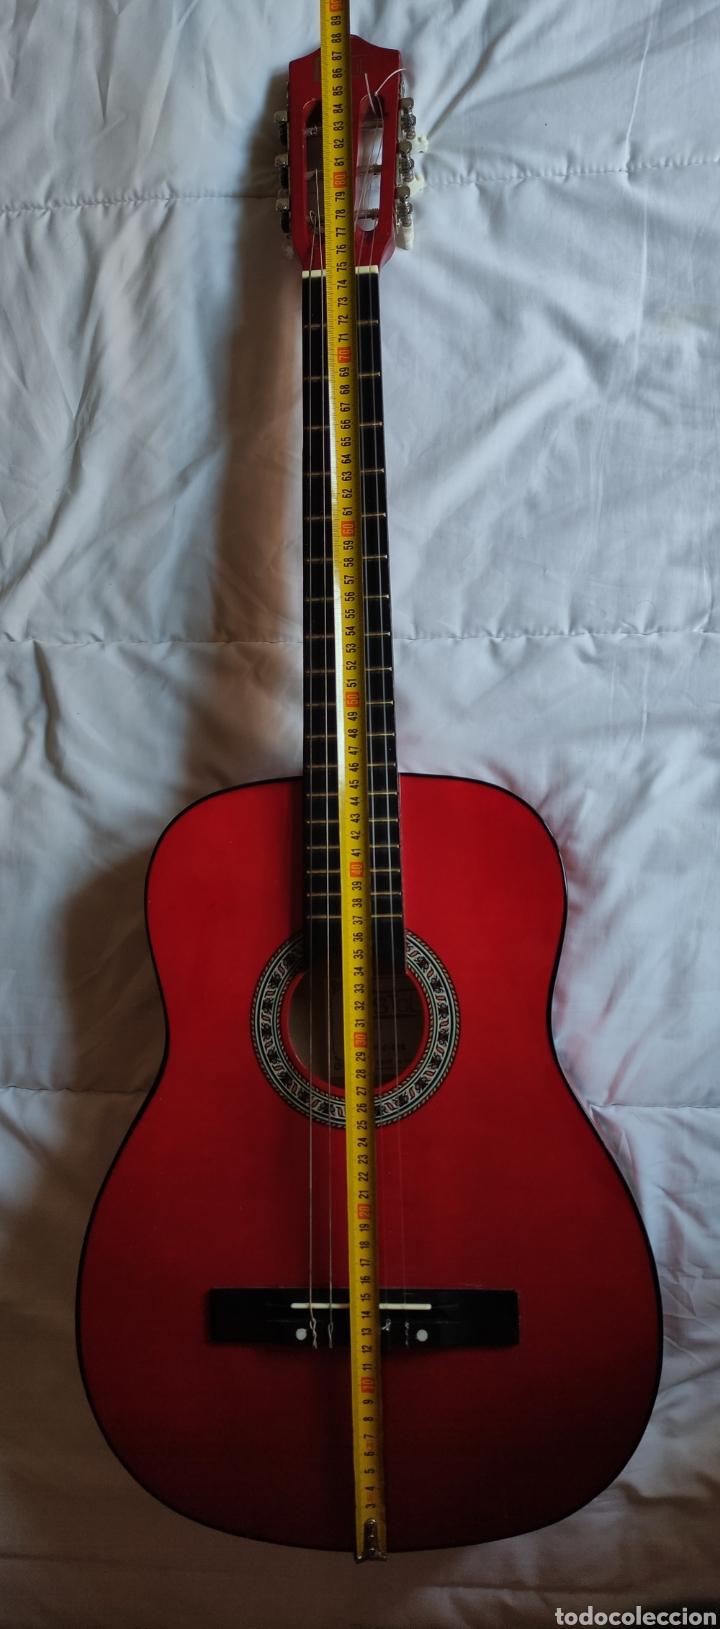 Instrumentos musicales: Guitarra - Foto 19 - 228417015